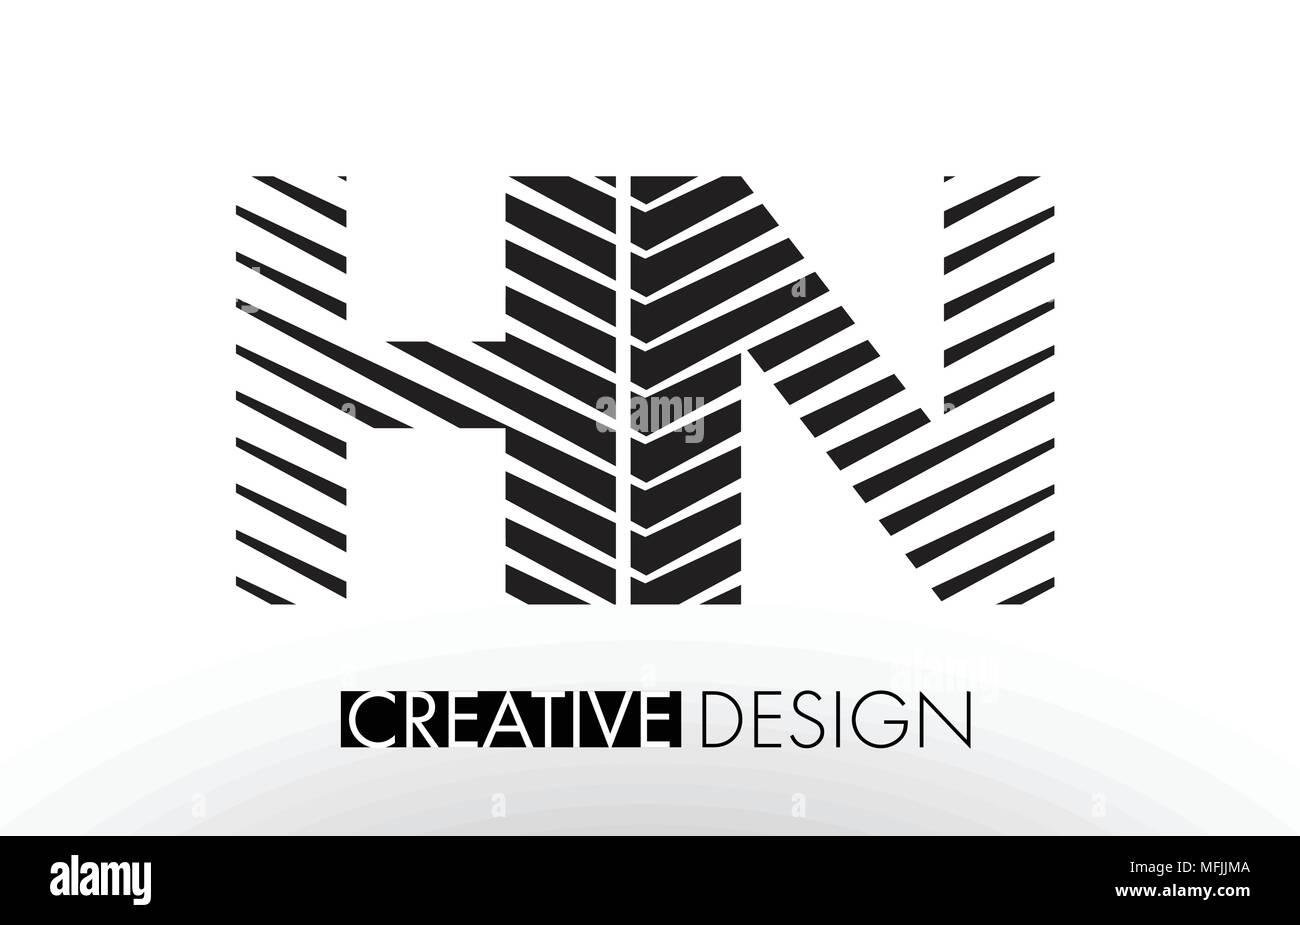 HN H N Lines Letter Design with Creative Elegant Zebra Vector Illustration. Stock Vector